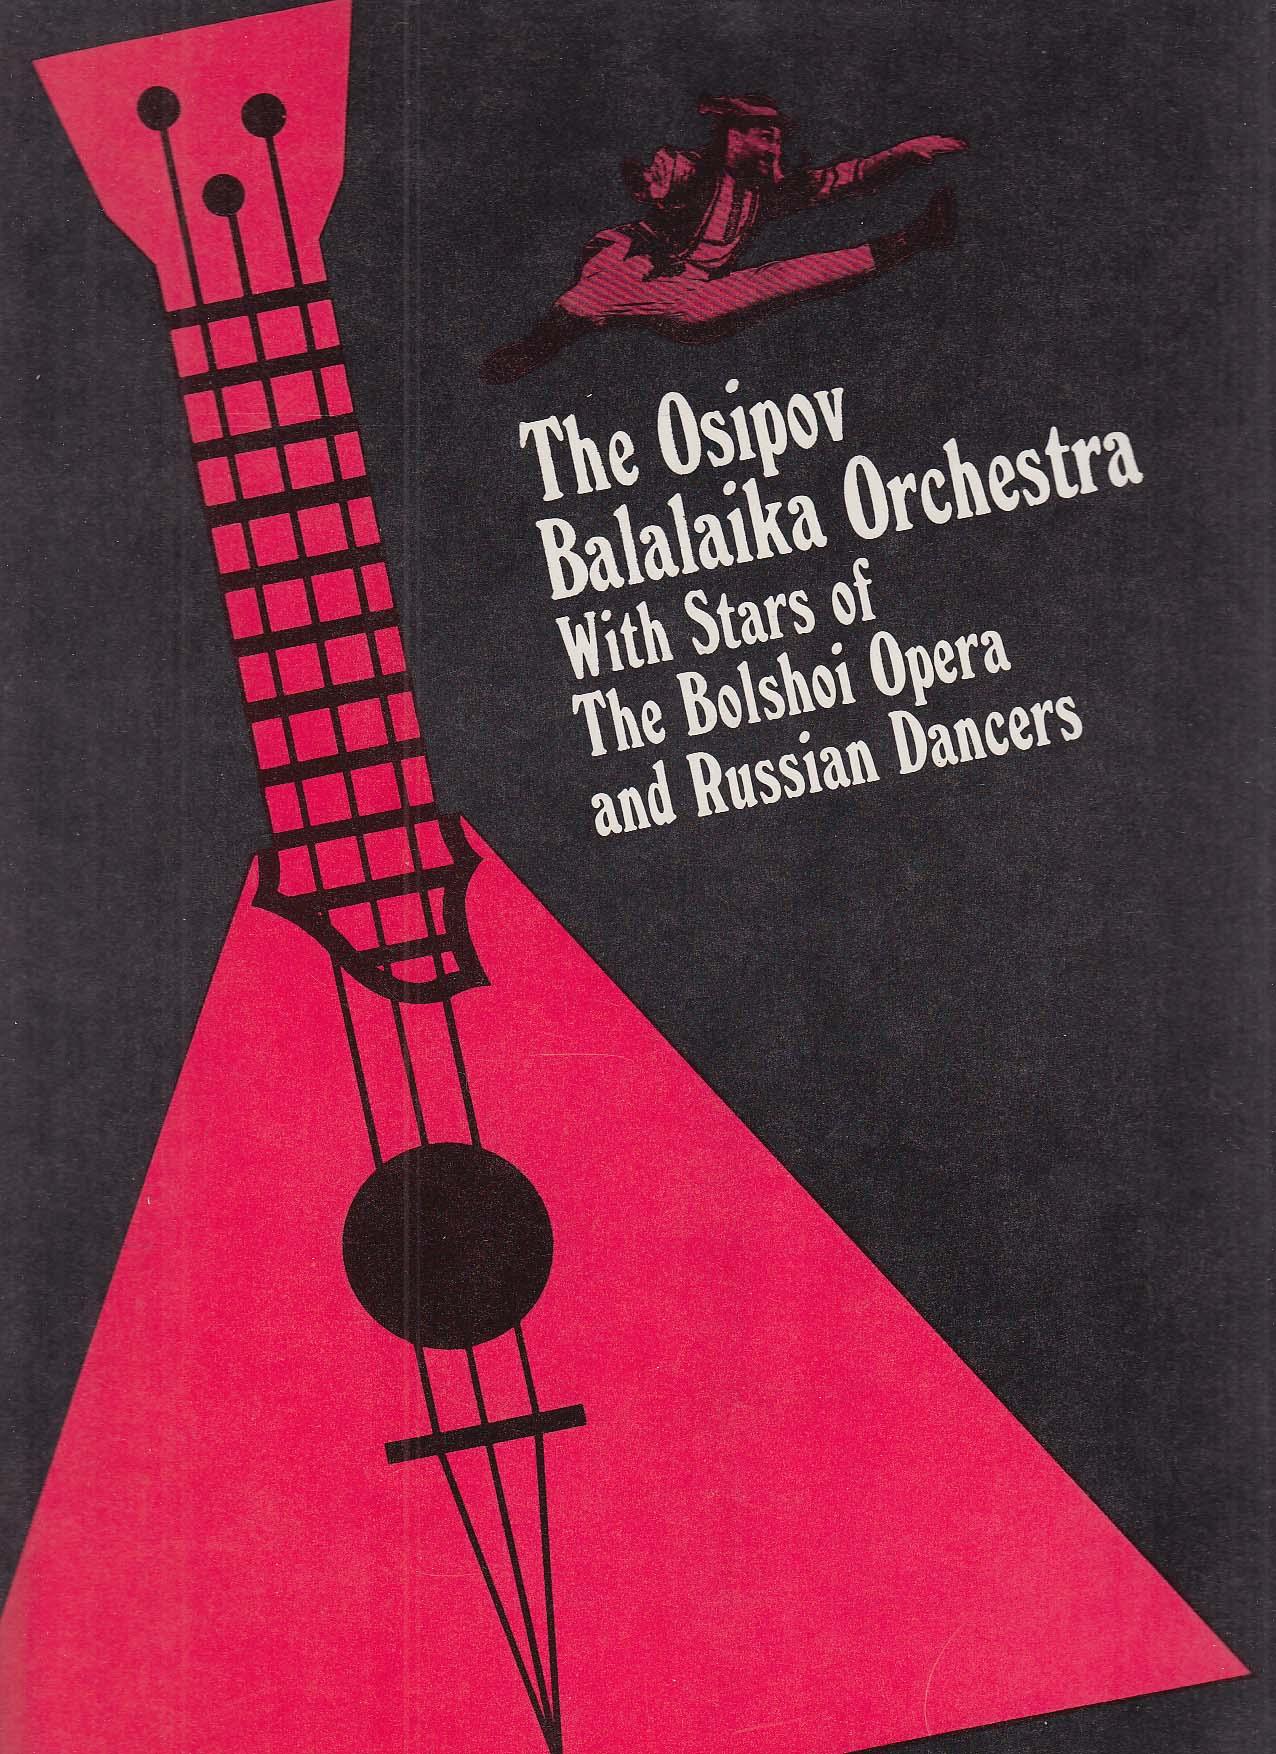 1971 Osipov Balalaika Orchestra program